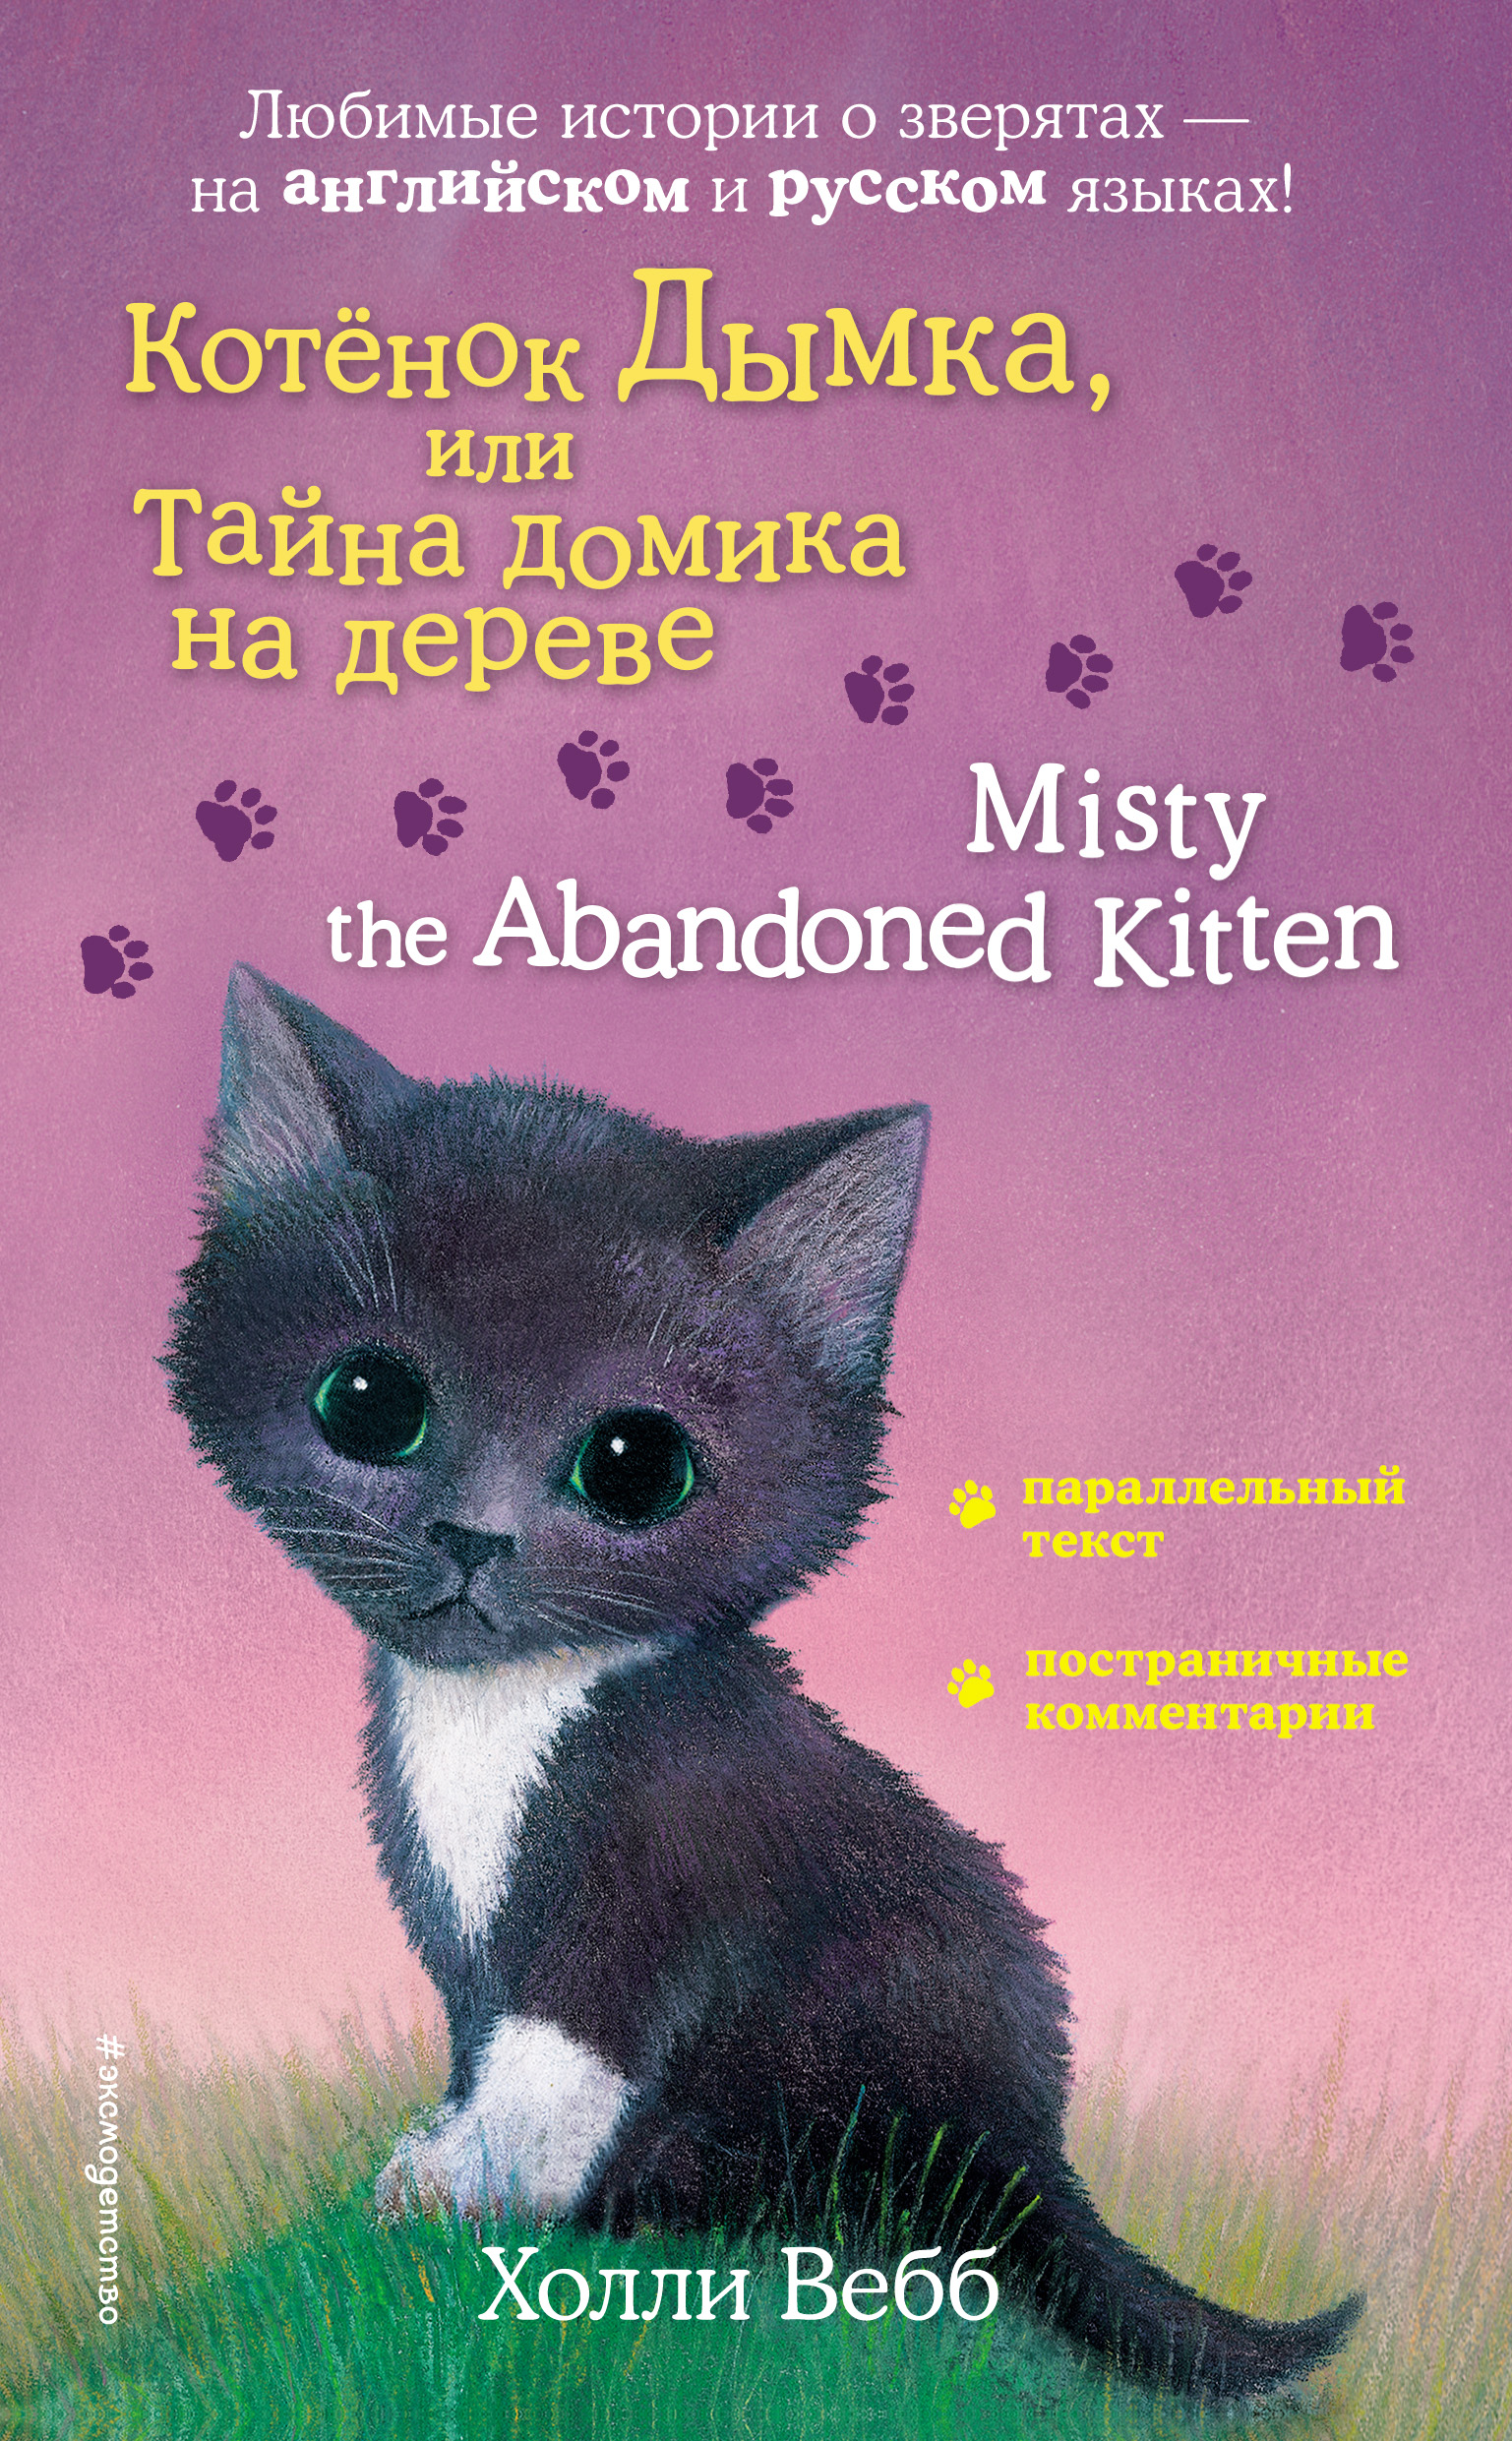 Котёнок Дымка, или Тайна домика на дереве / Misty the Abandoned Kitten